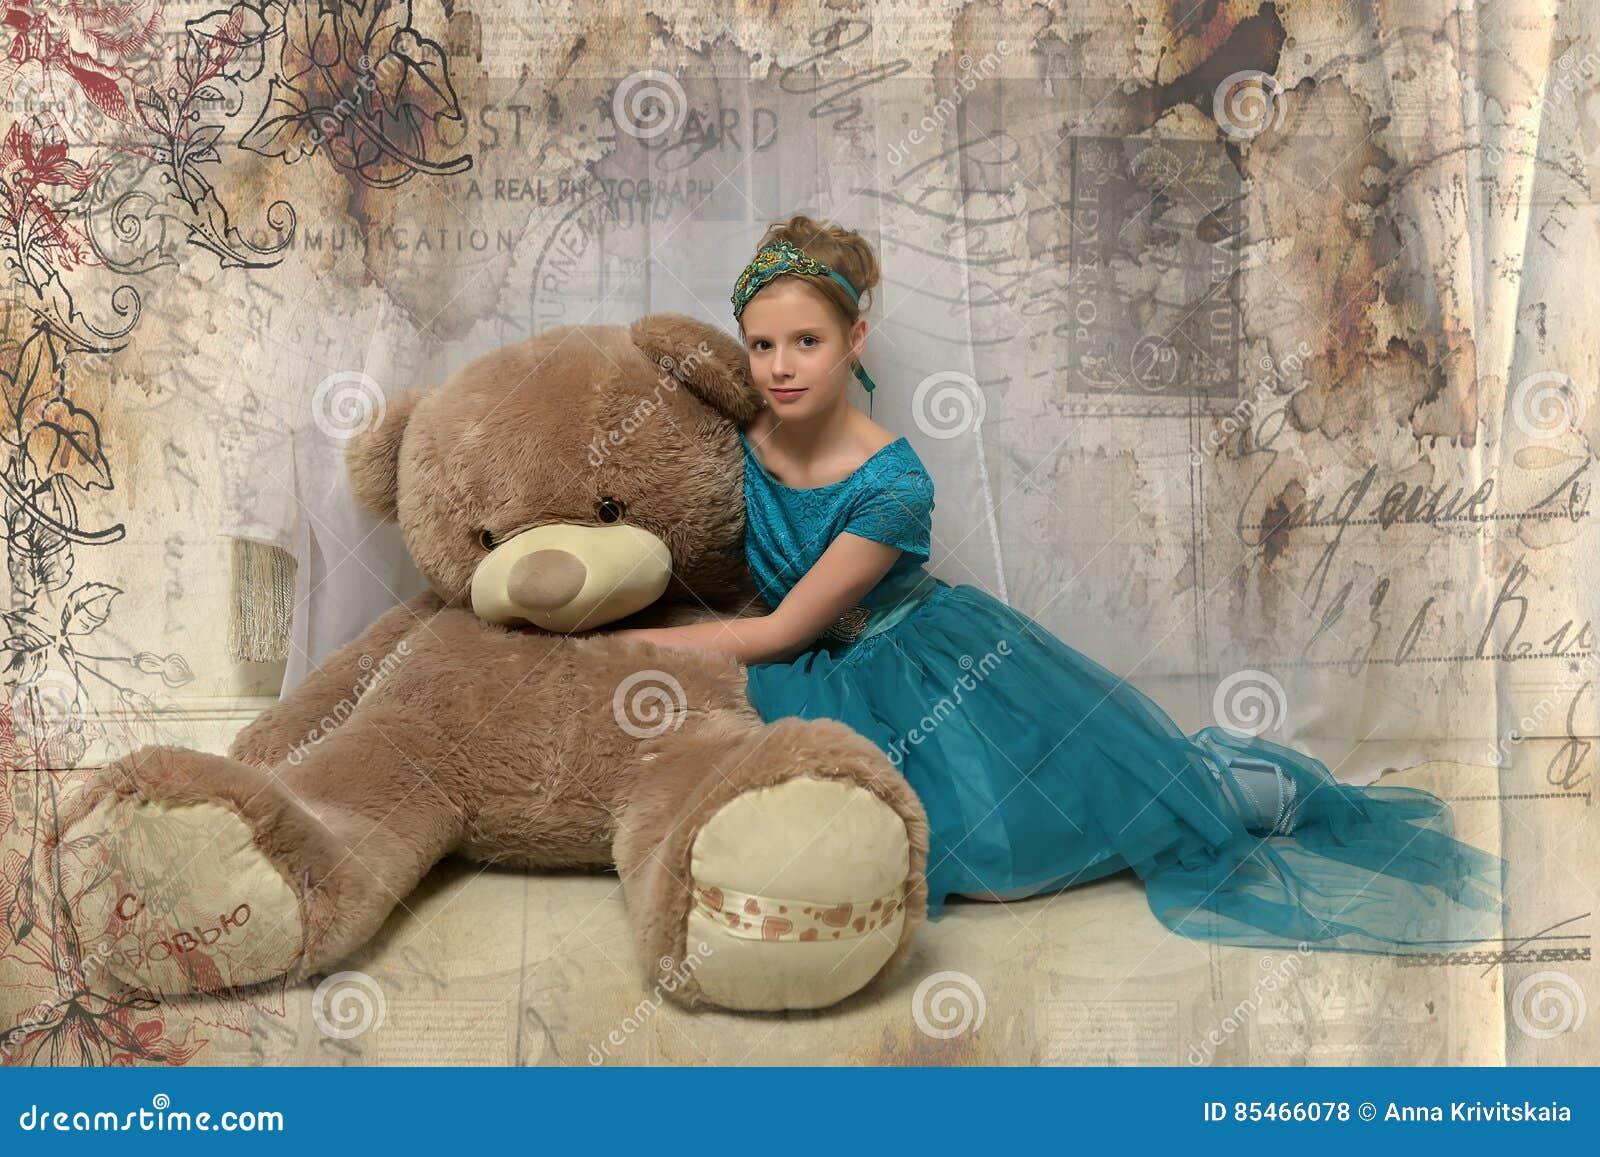 Girl with huge teddybear